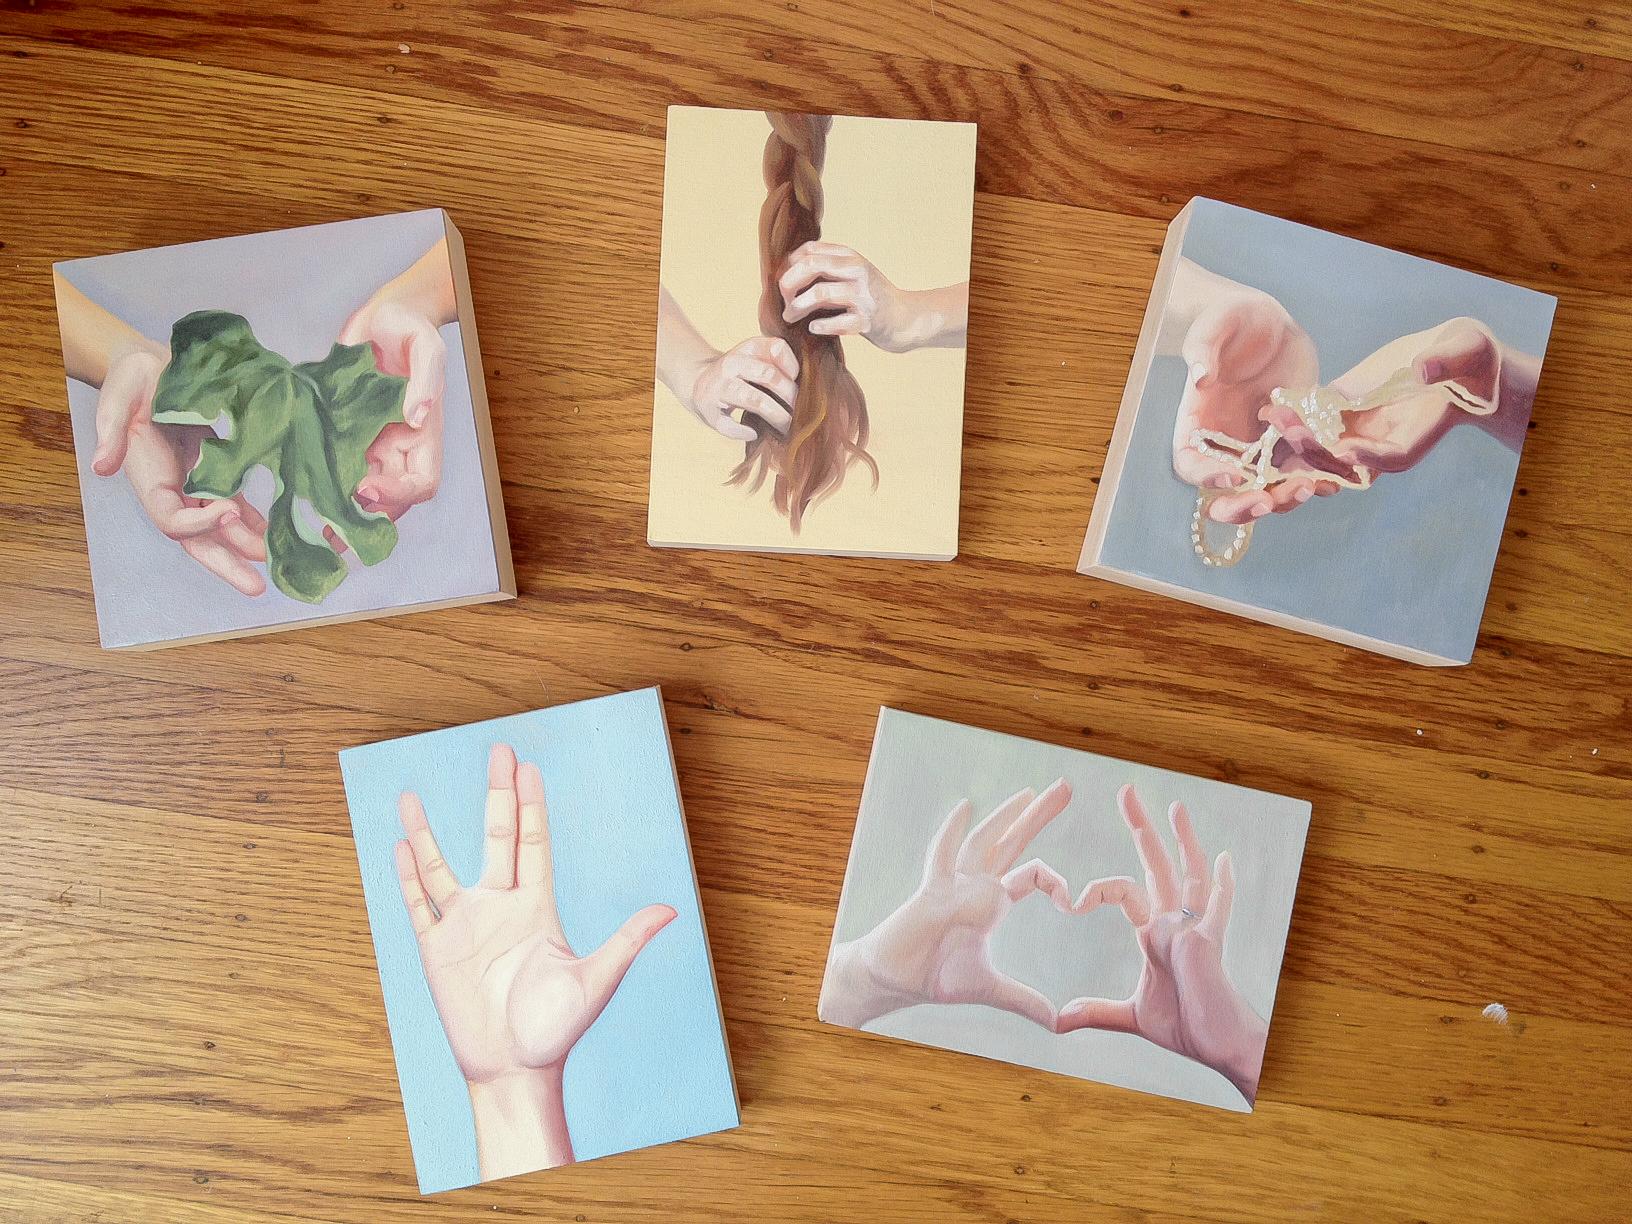 Hand Studies.jpg